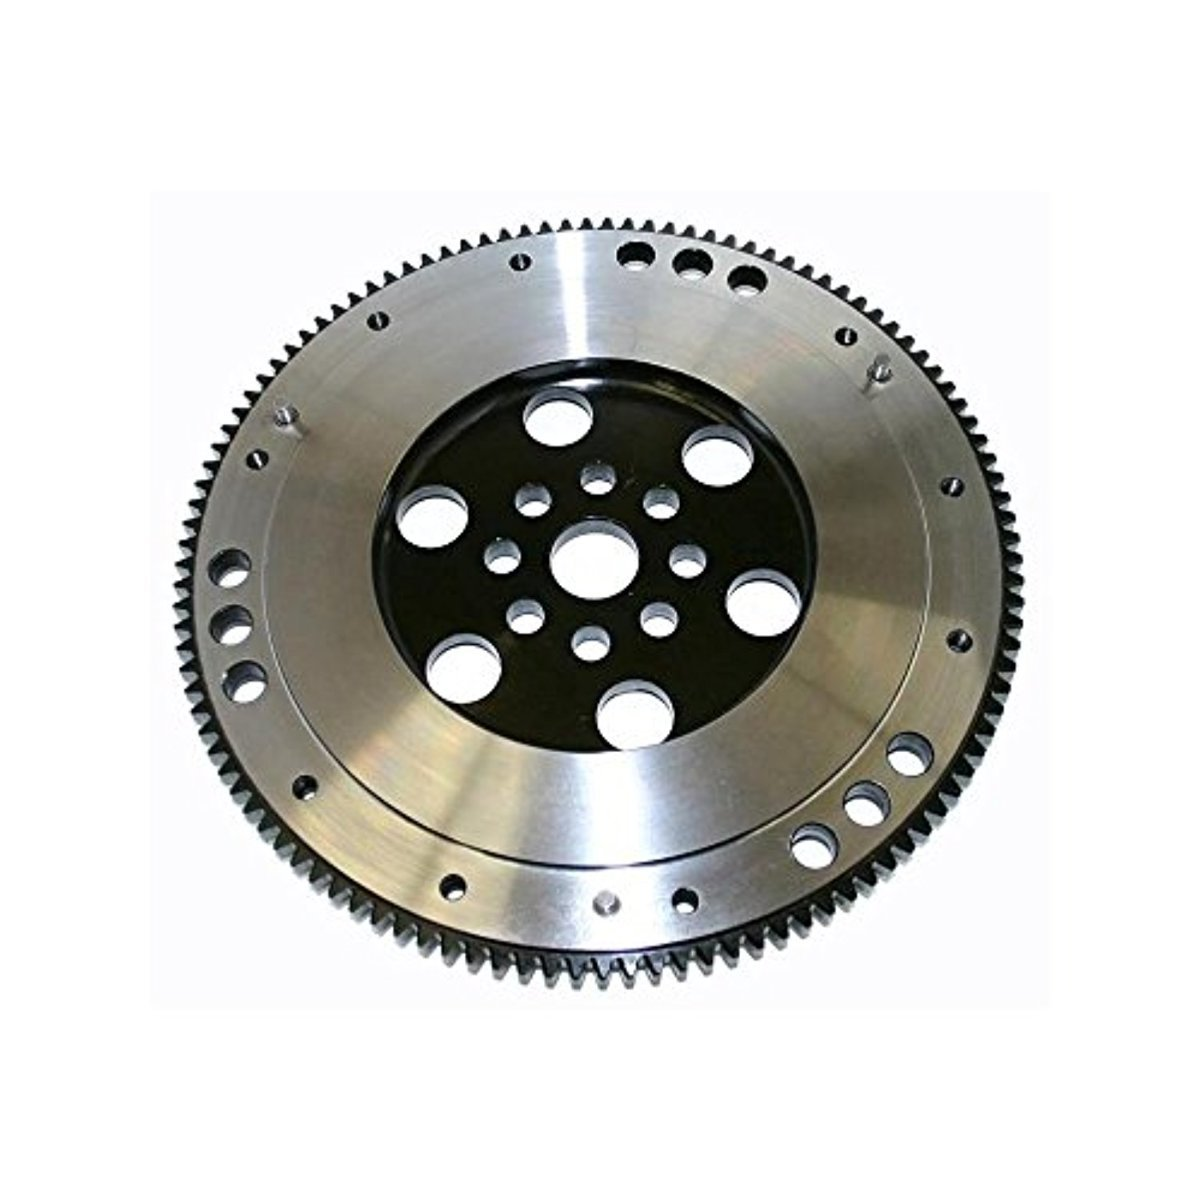 03-07 G35 18.65Lb Steel Flywheel Competition Clutch 2-350Z-ST Comp Clutch 03-06 350Z